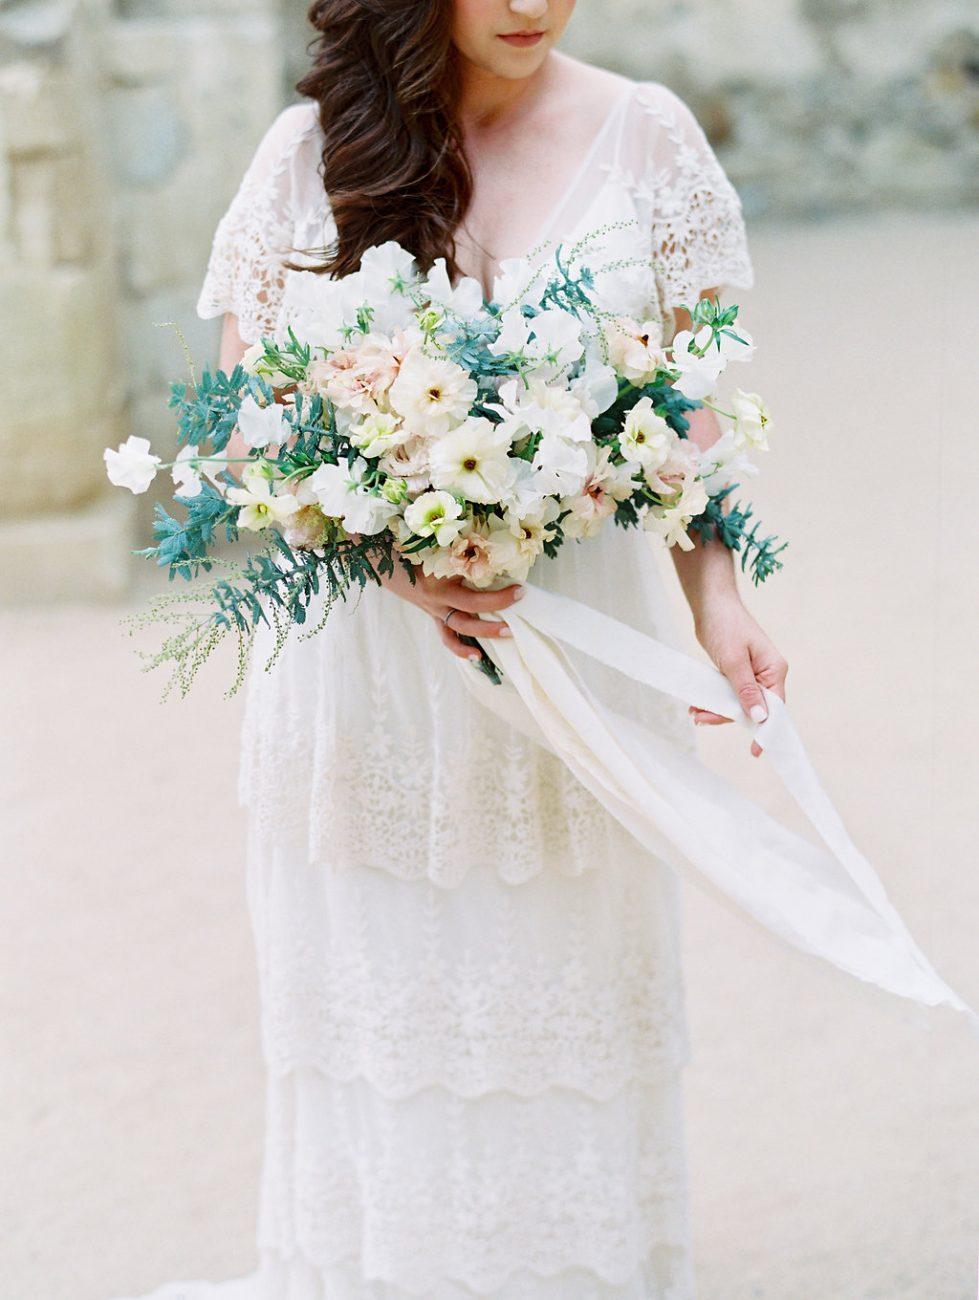 Orange Country wedding inspiration bride holding ribbons